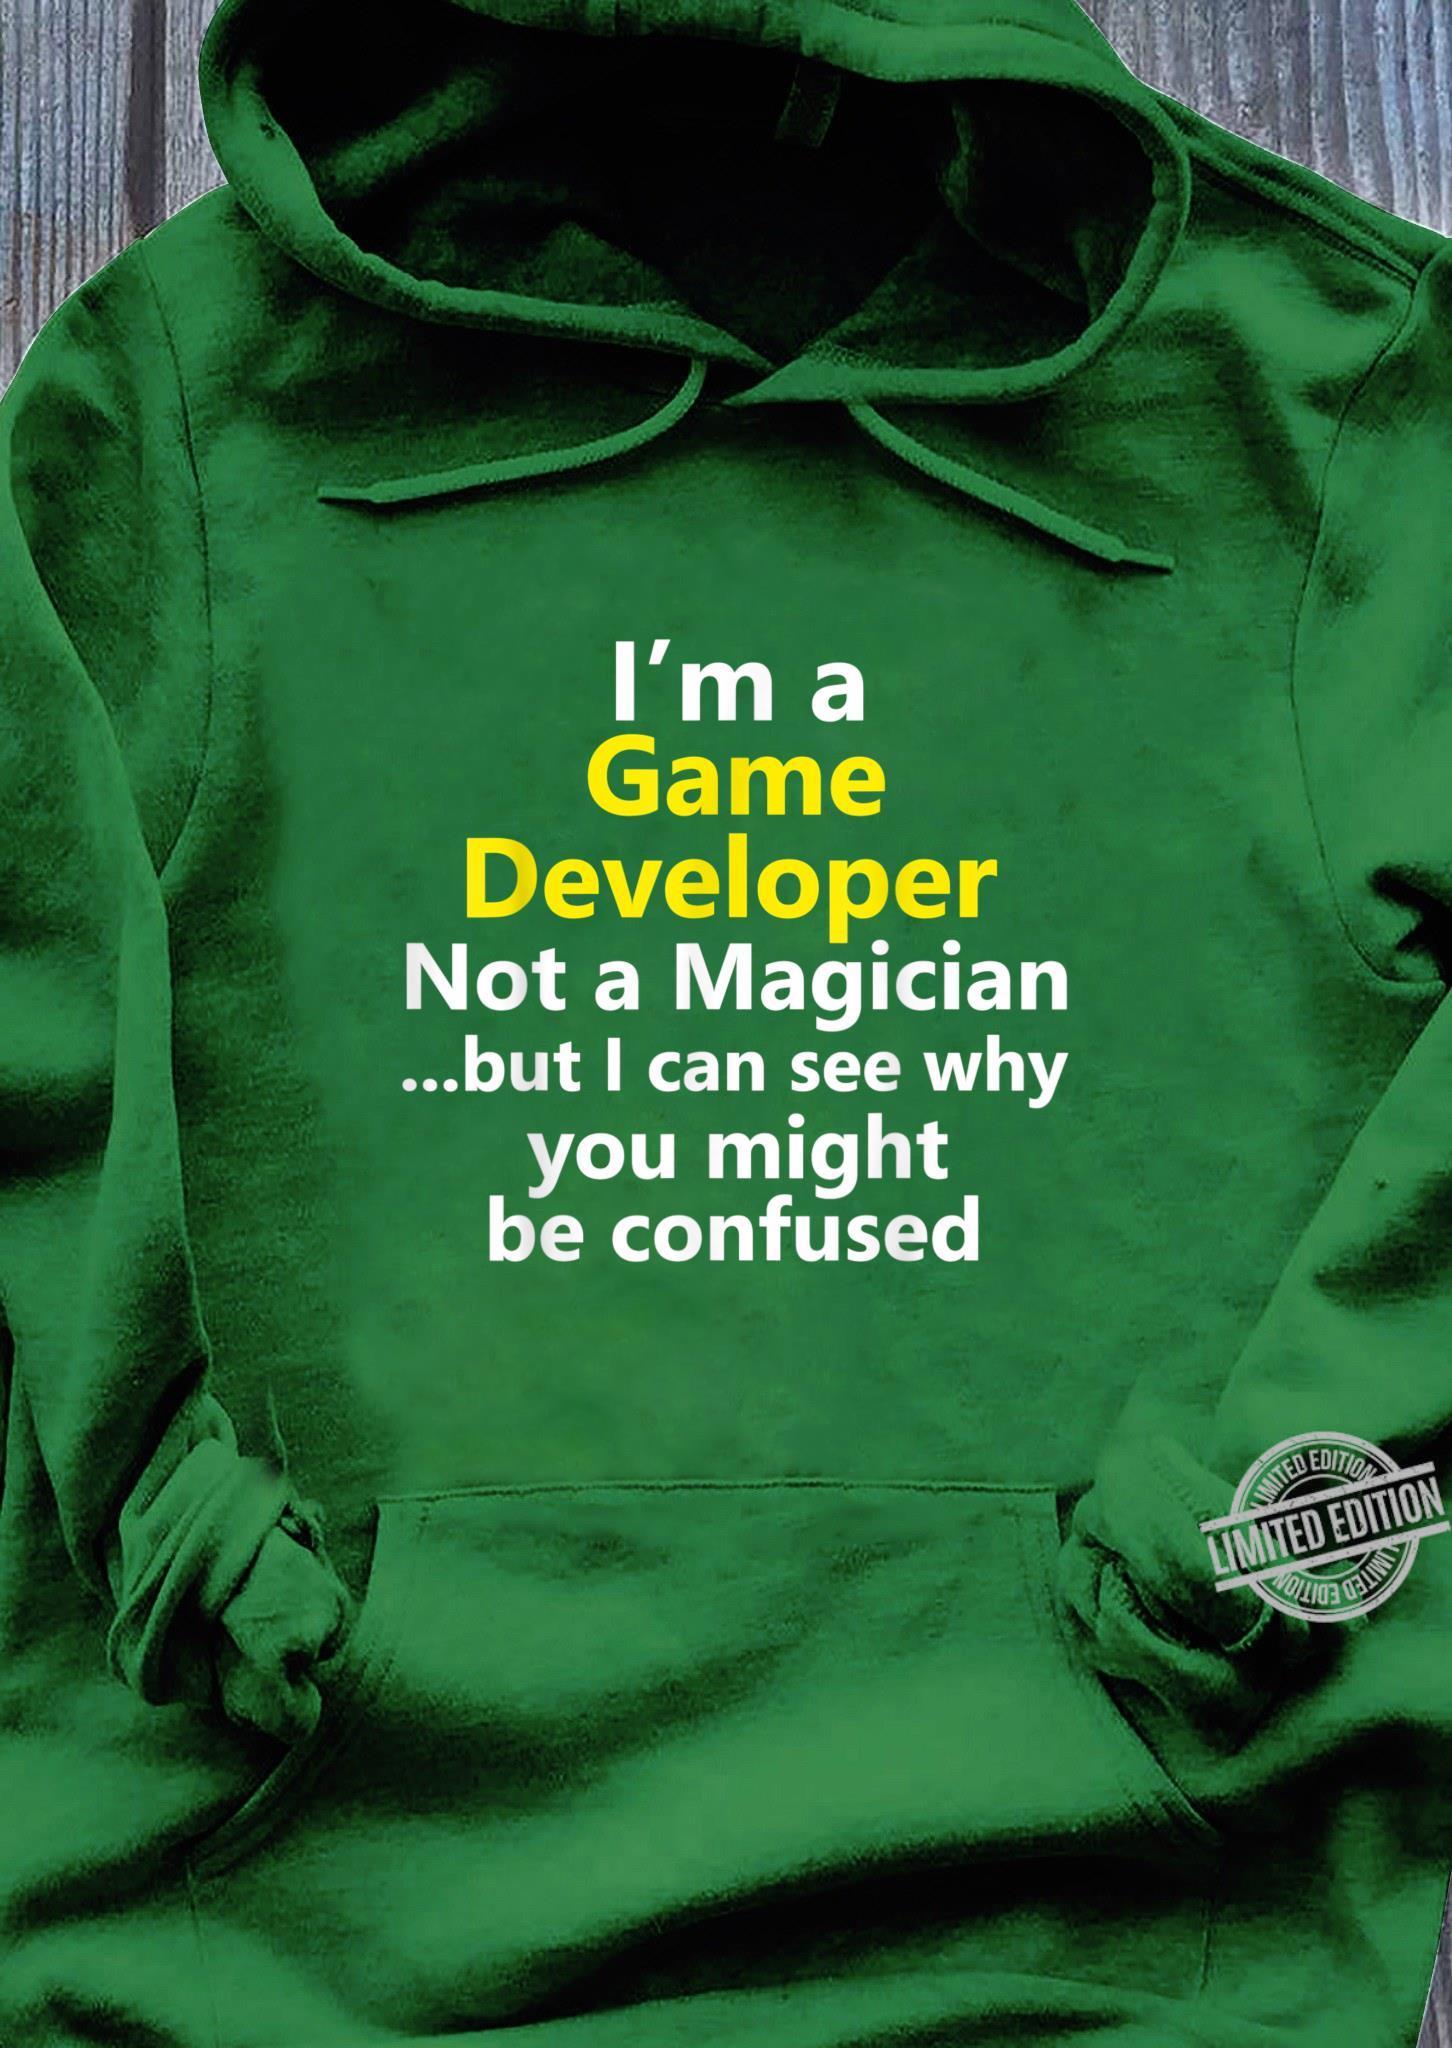 Spieleentwickler Mobile App Video Indie Designer Videogame Shirt hoodie